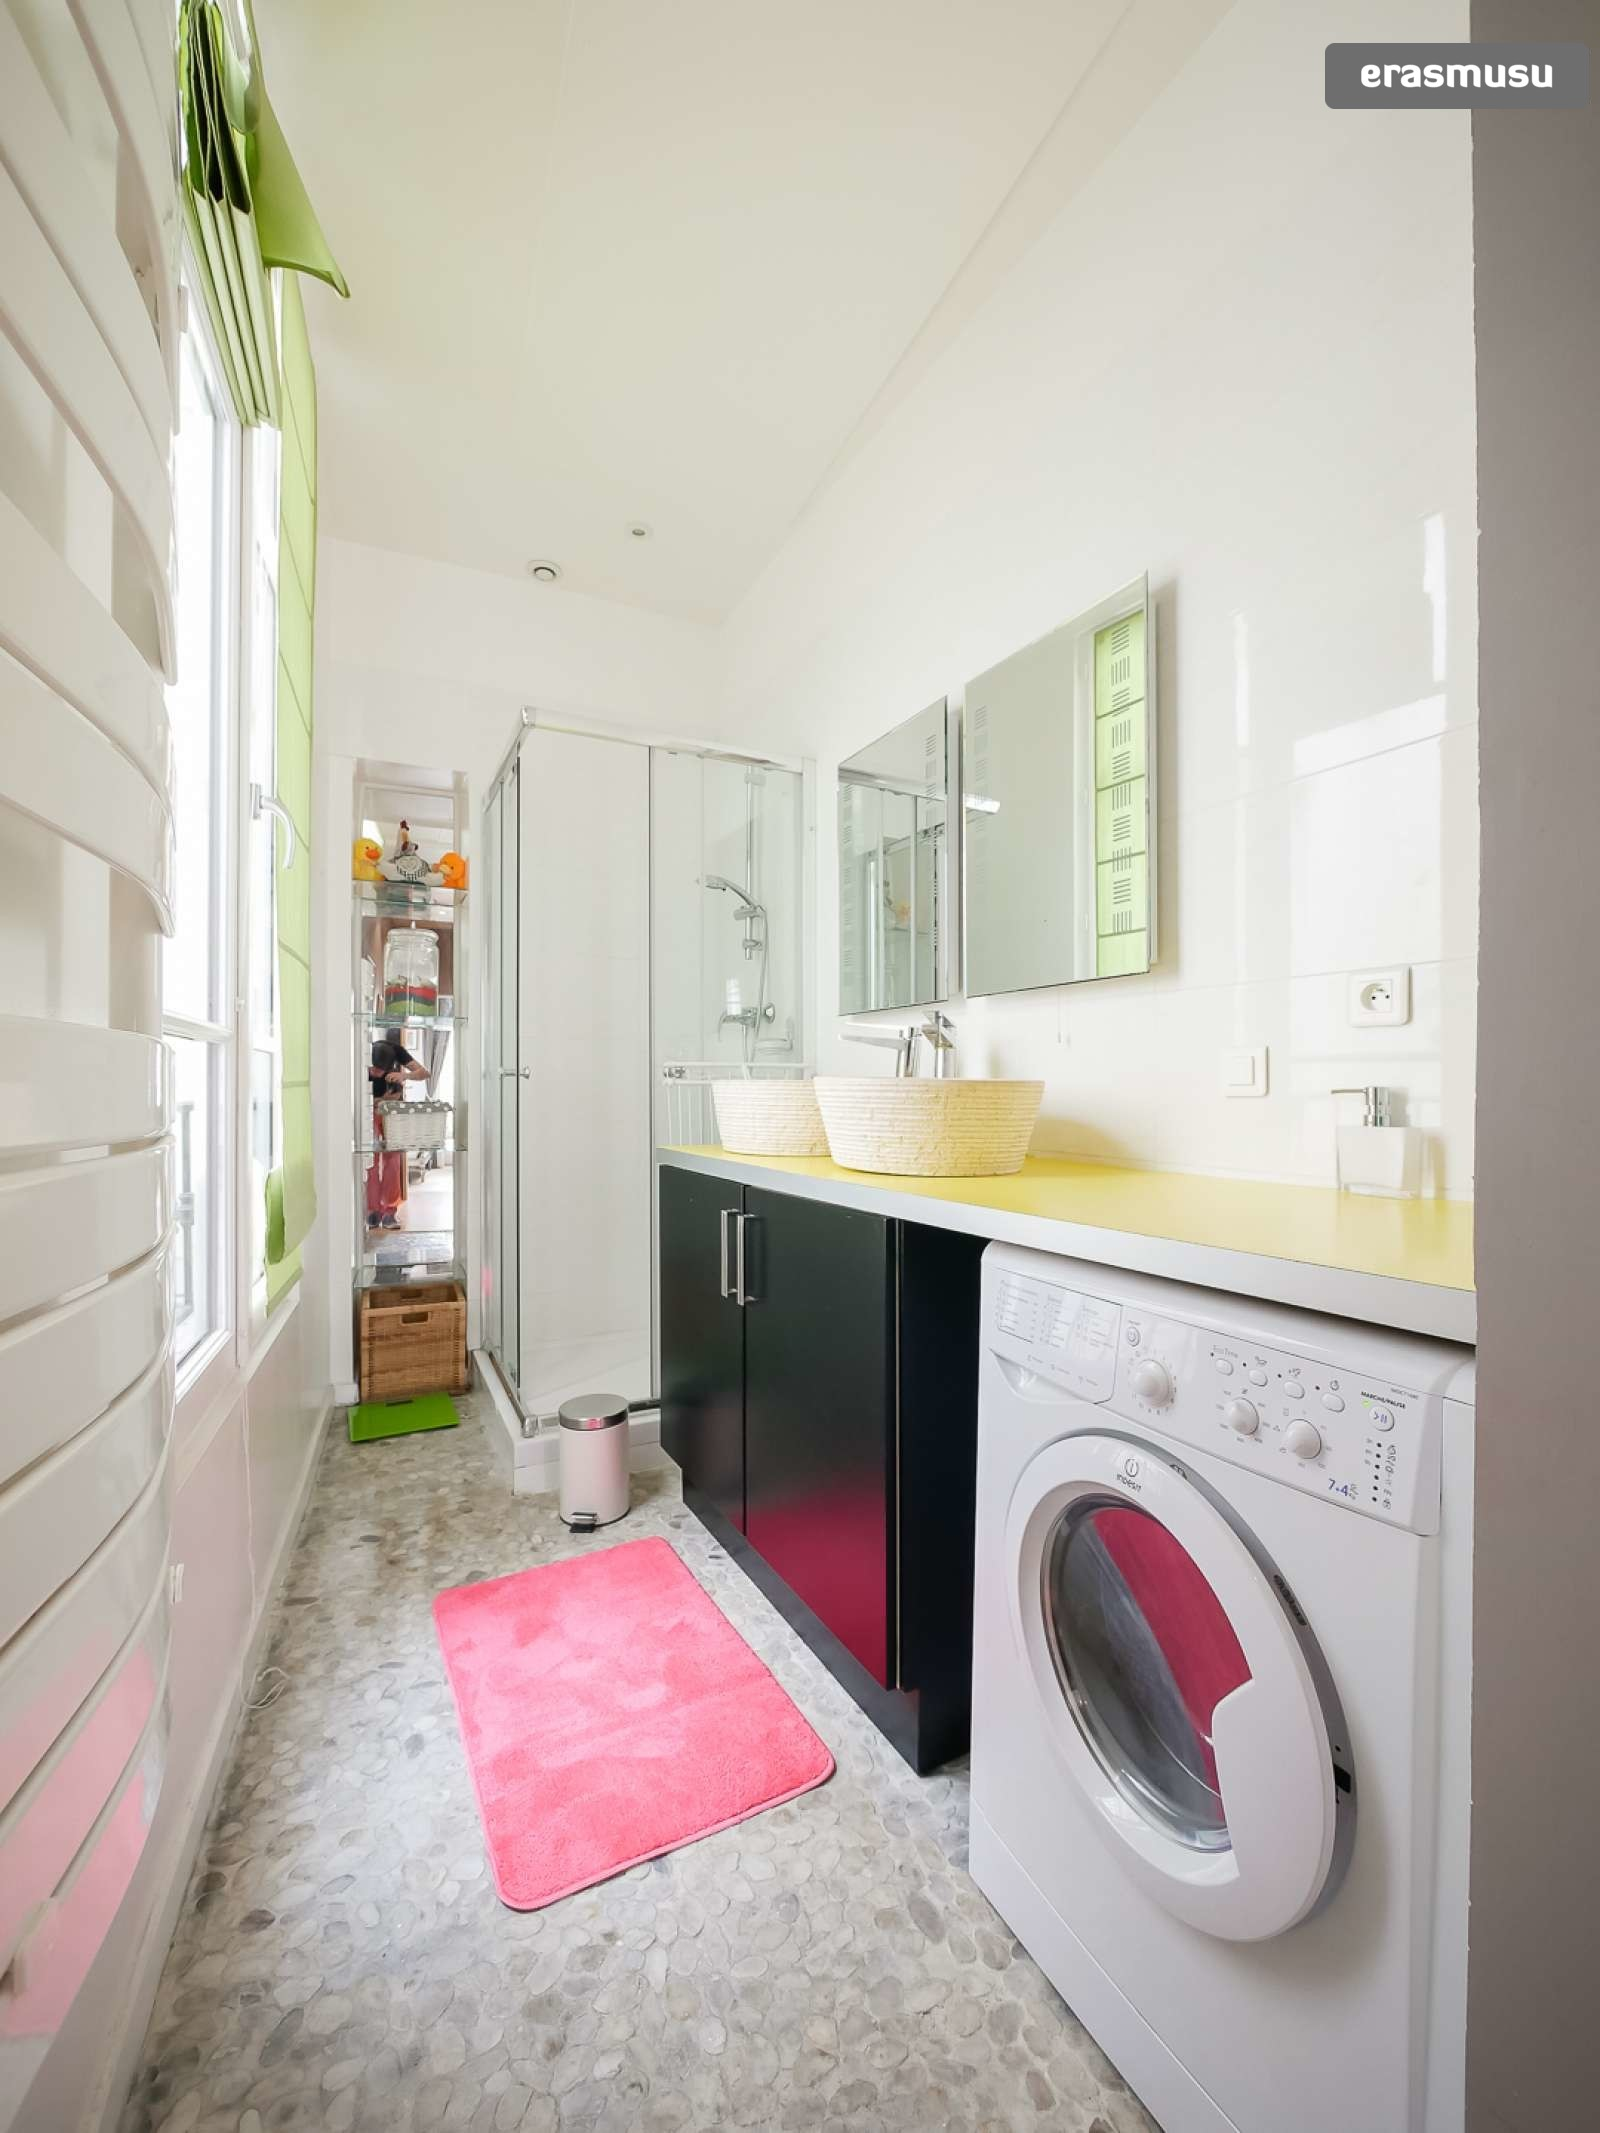 spacious-2-bedroom-apartment-rent-cordeliers-3b514d917645fa172c1